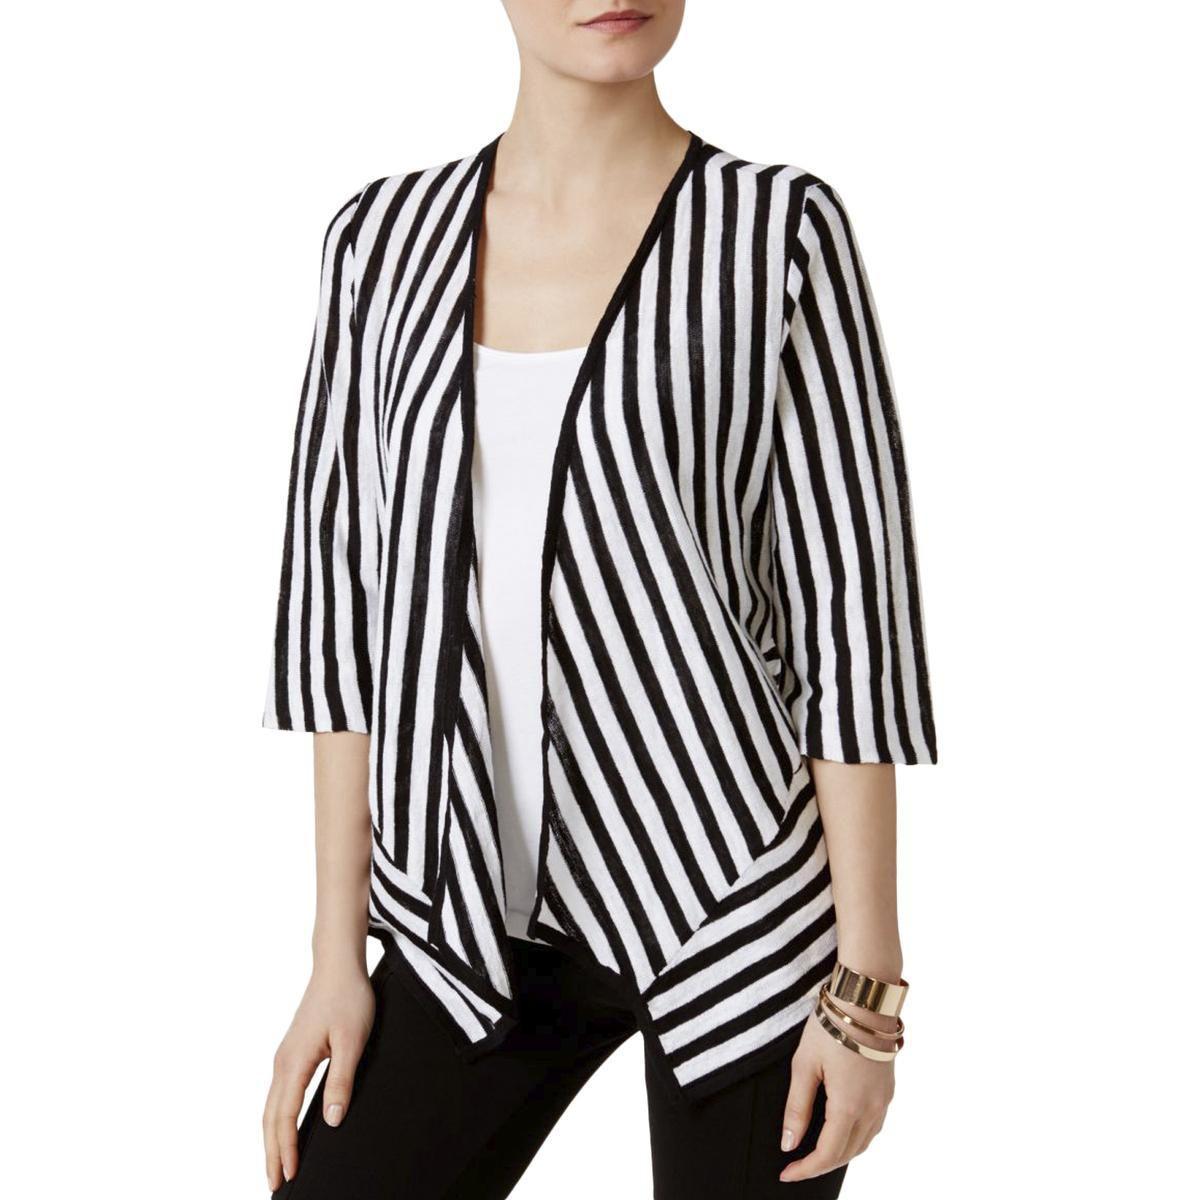 2730c336590804 Lyst - Alfani Womens Linen Striped Cardigan Top in Black